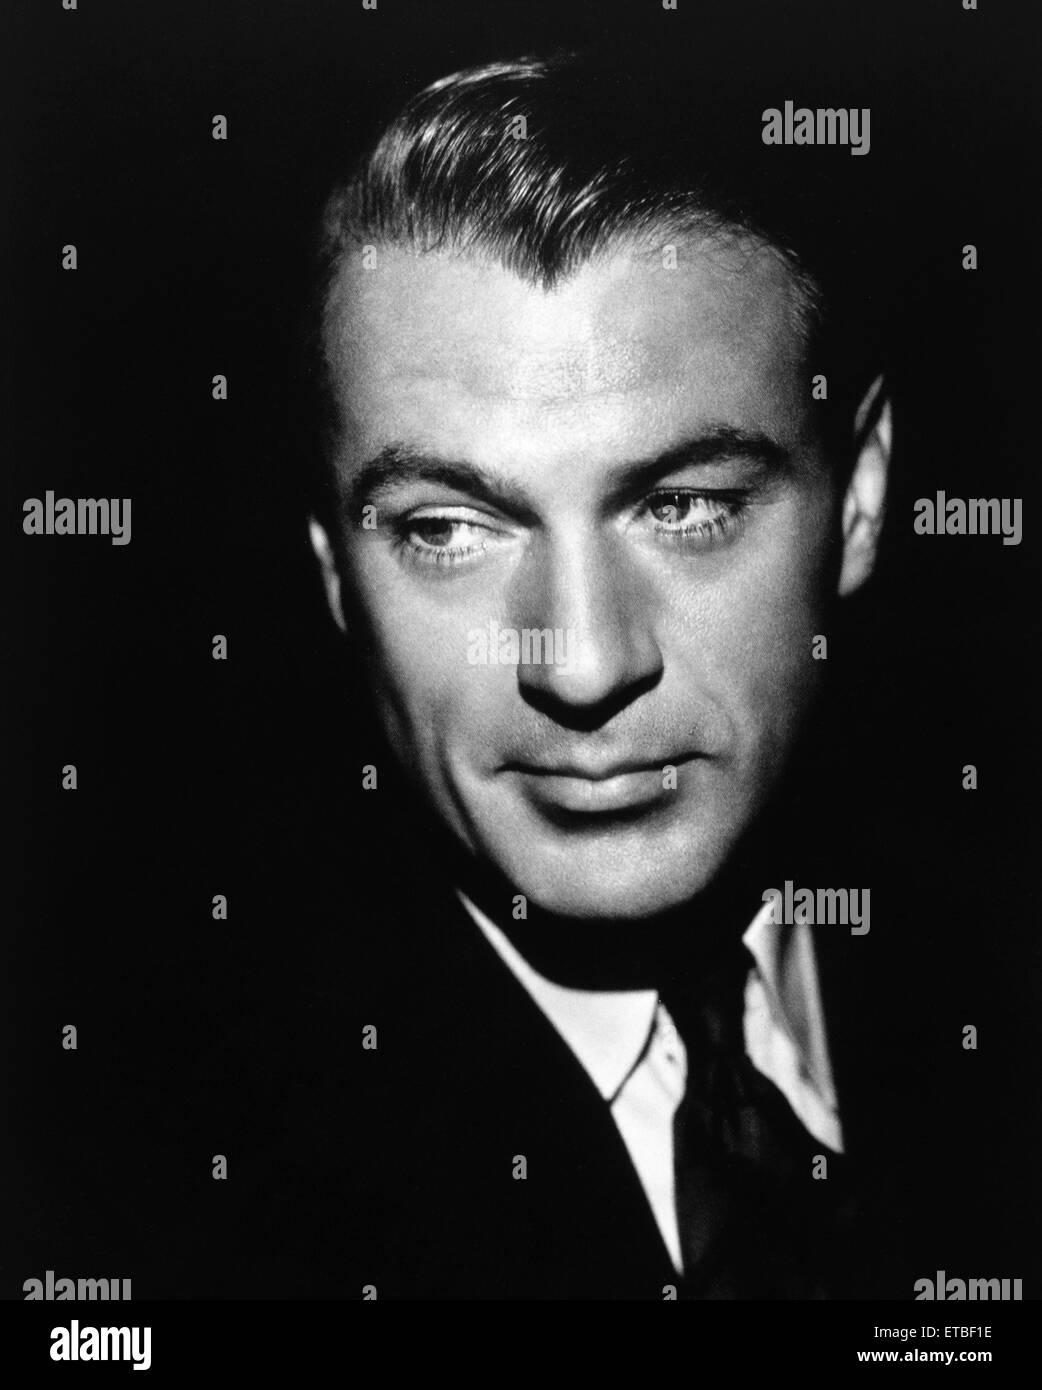 Schauspieler Gary Cooper, Portrait, 1941 Stockbild